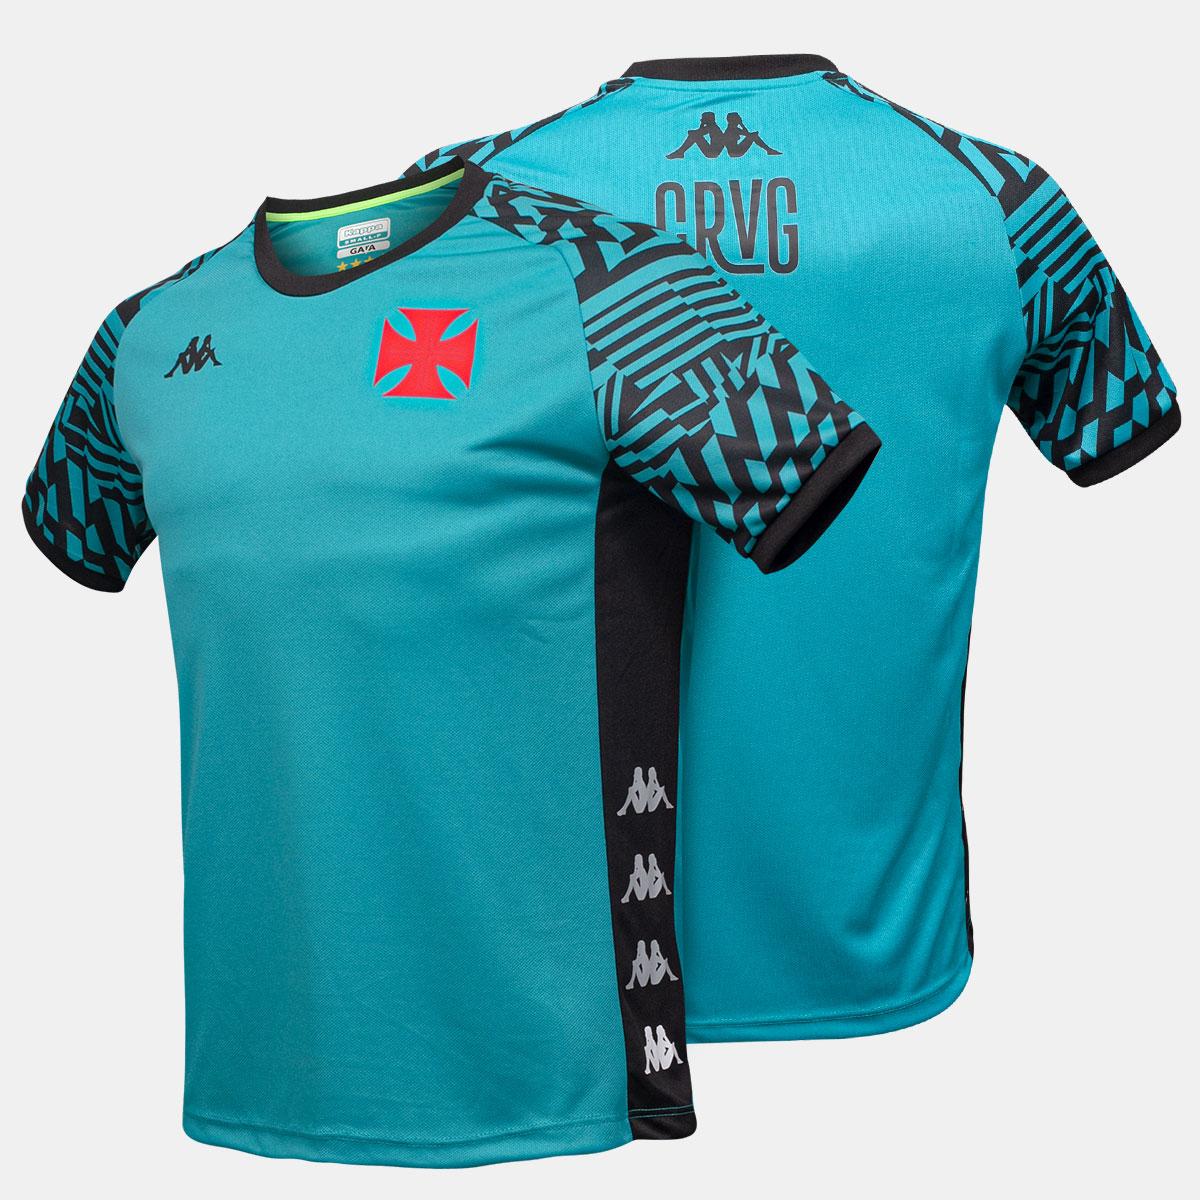 Camisa Vasco Mascuina Treino Atleta Kappa 2021